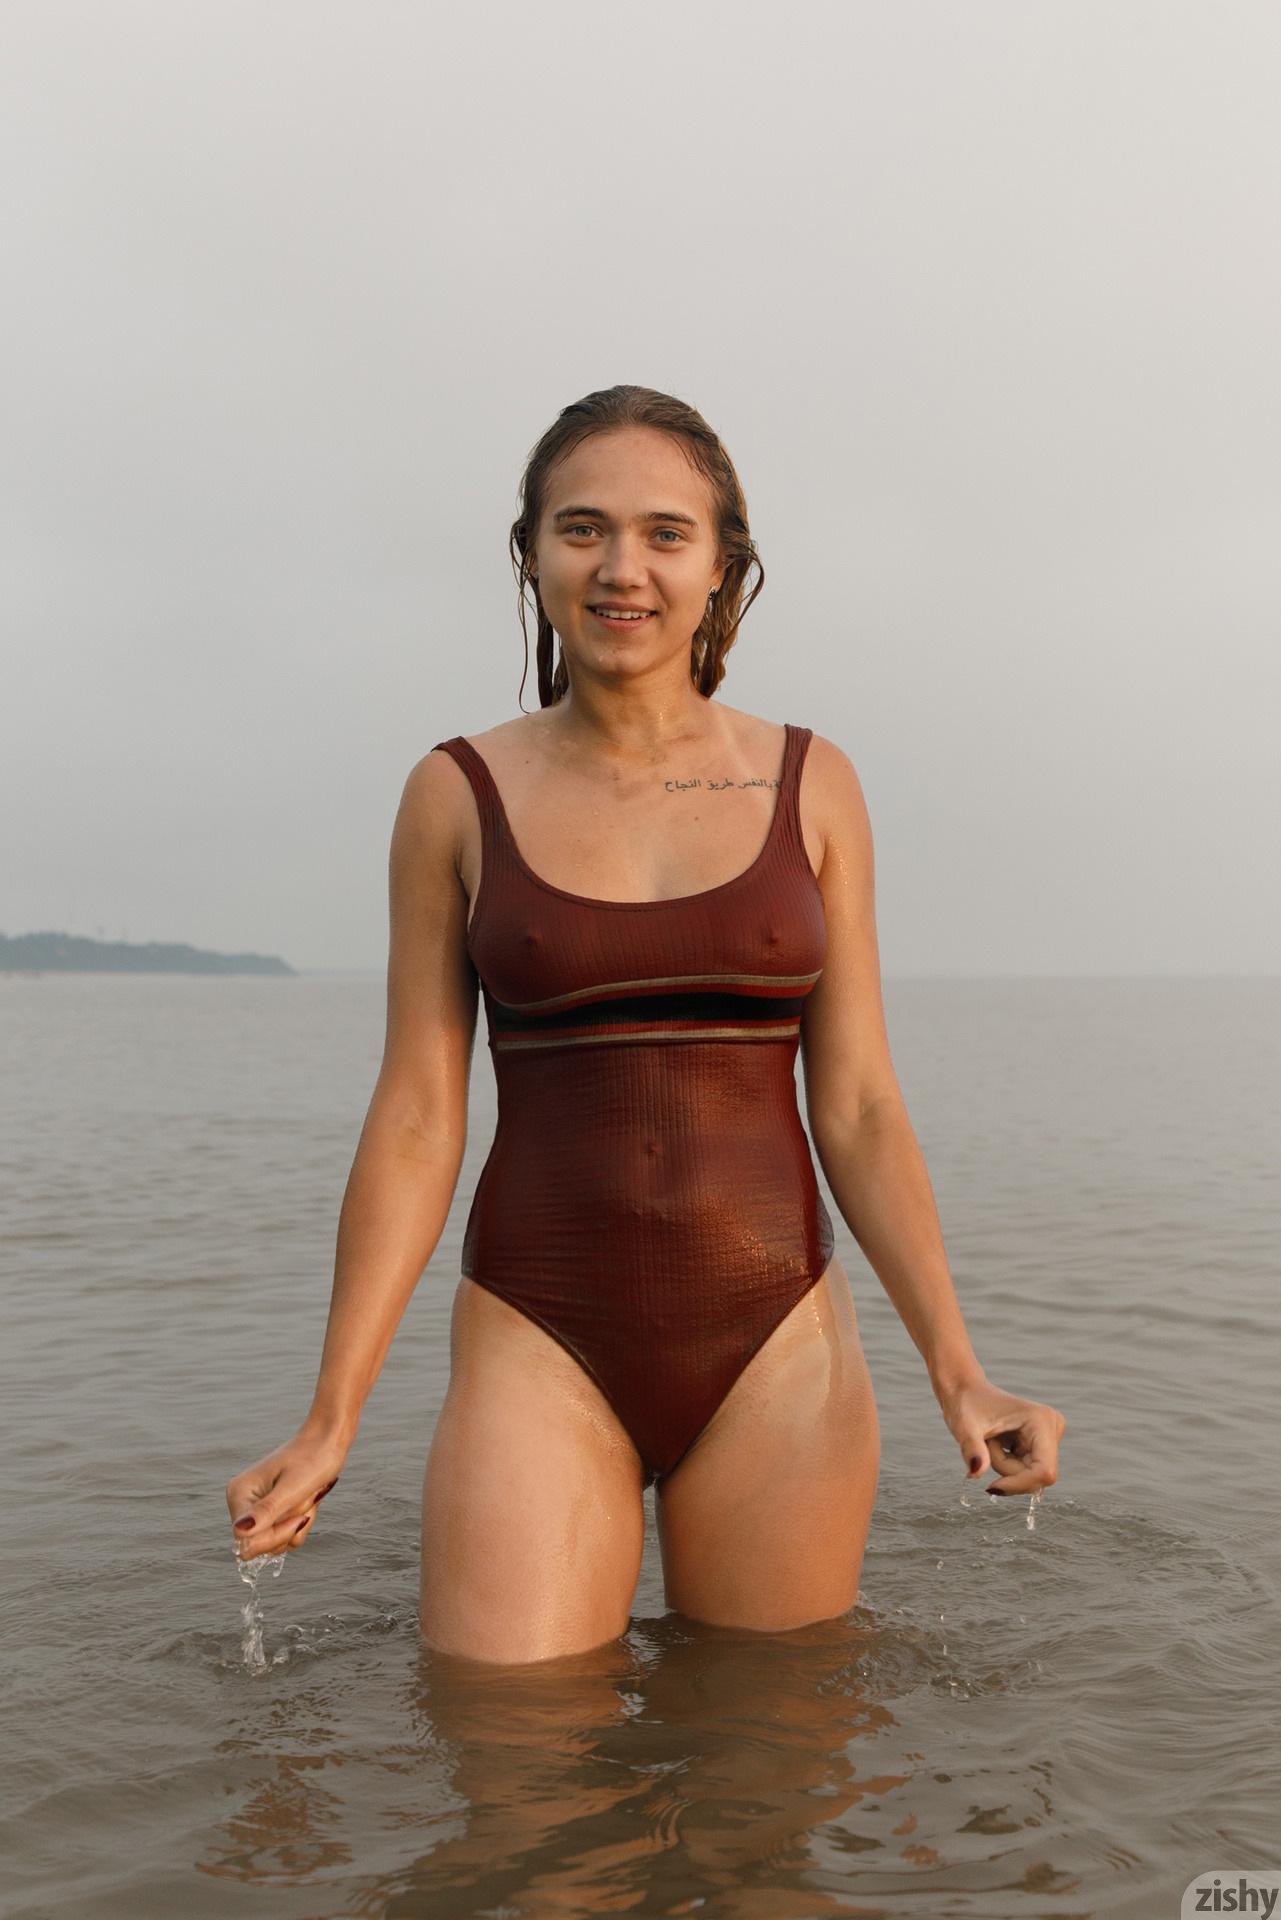 Sofia Orlova On Gryaznyy Beach Zishy (84)